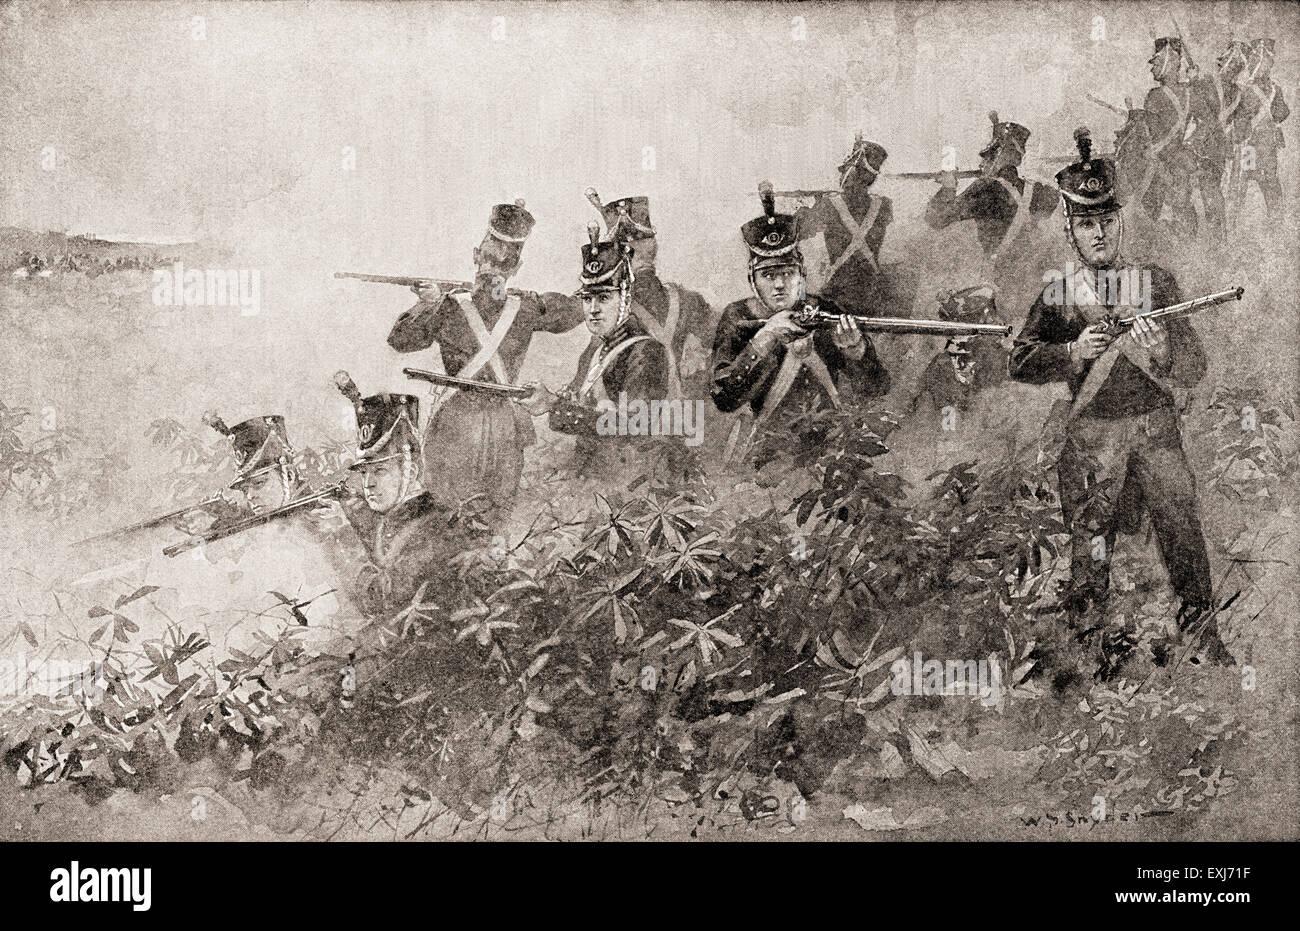 The Battle of  Tippecanoe,  November 7, 1811, during Tecumseh's War. - Stock Image